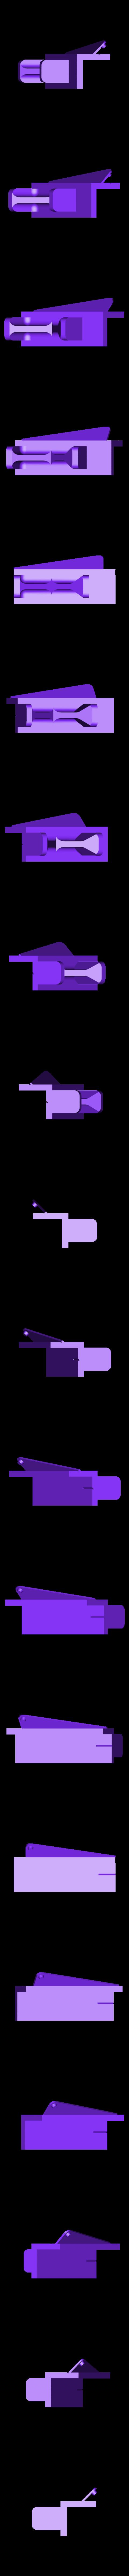 angle_cutter_stl.STL Download free STL file Foam Airplane Bevel Cutting Tool • Design to 3D print, Piva